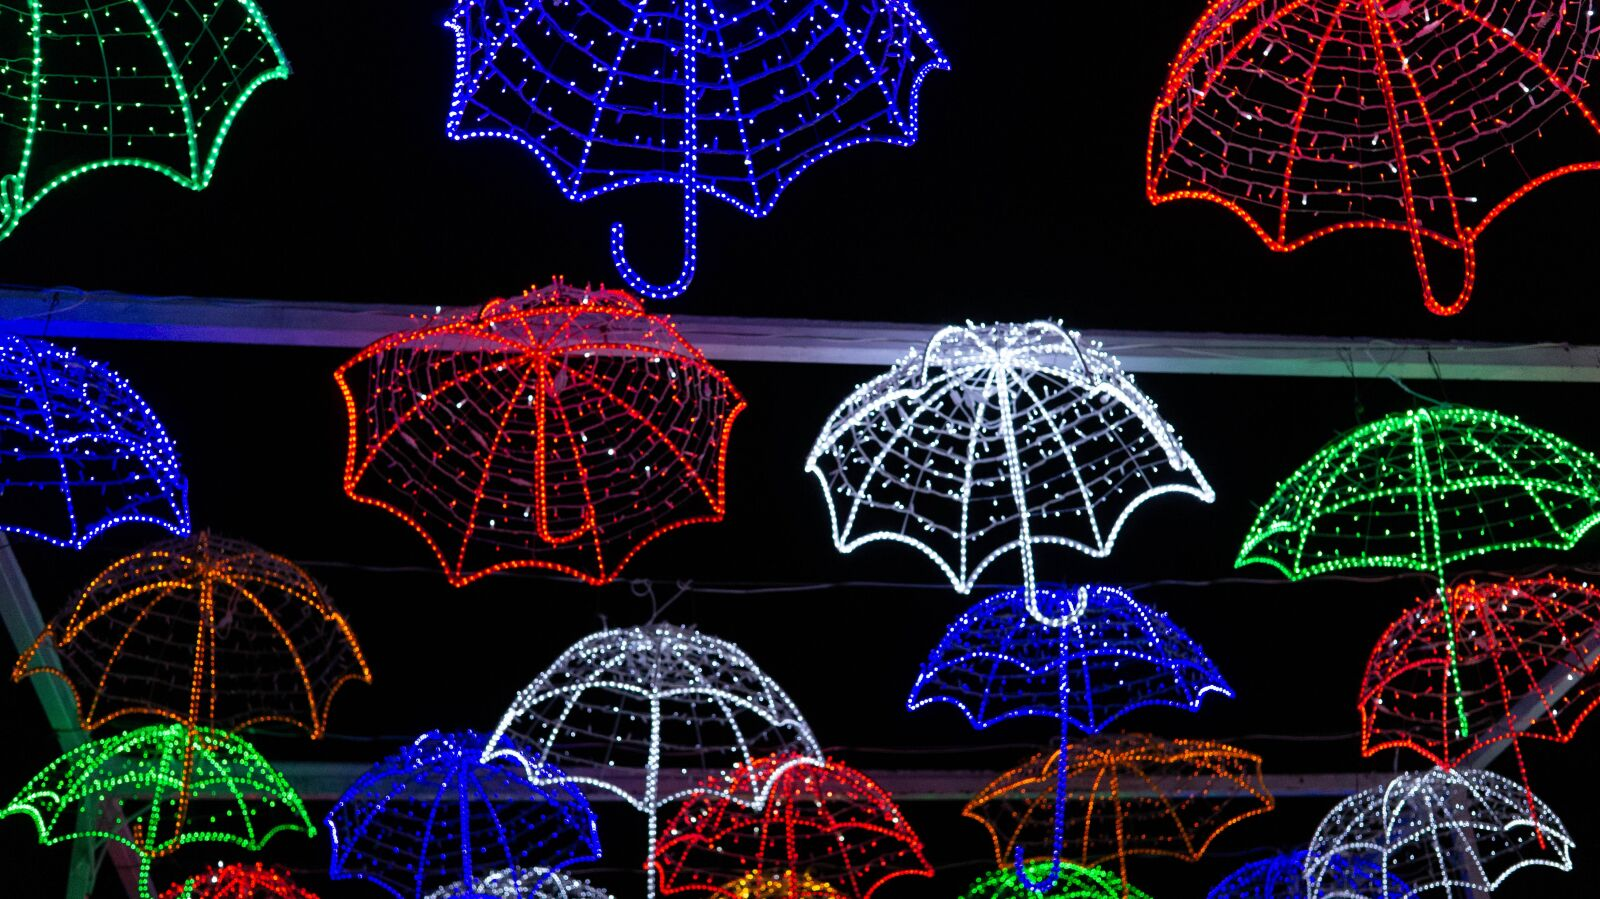 umbrellas, decor, umbrella